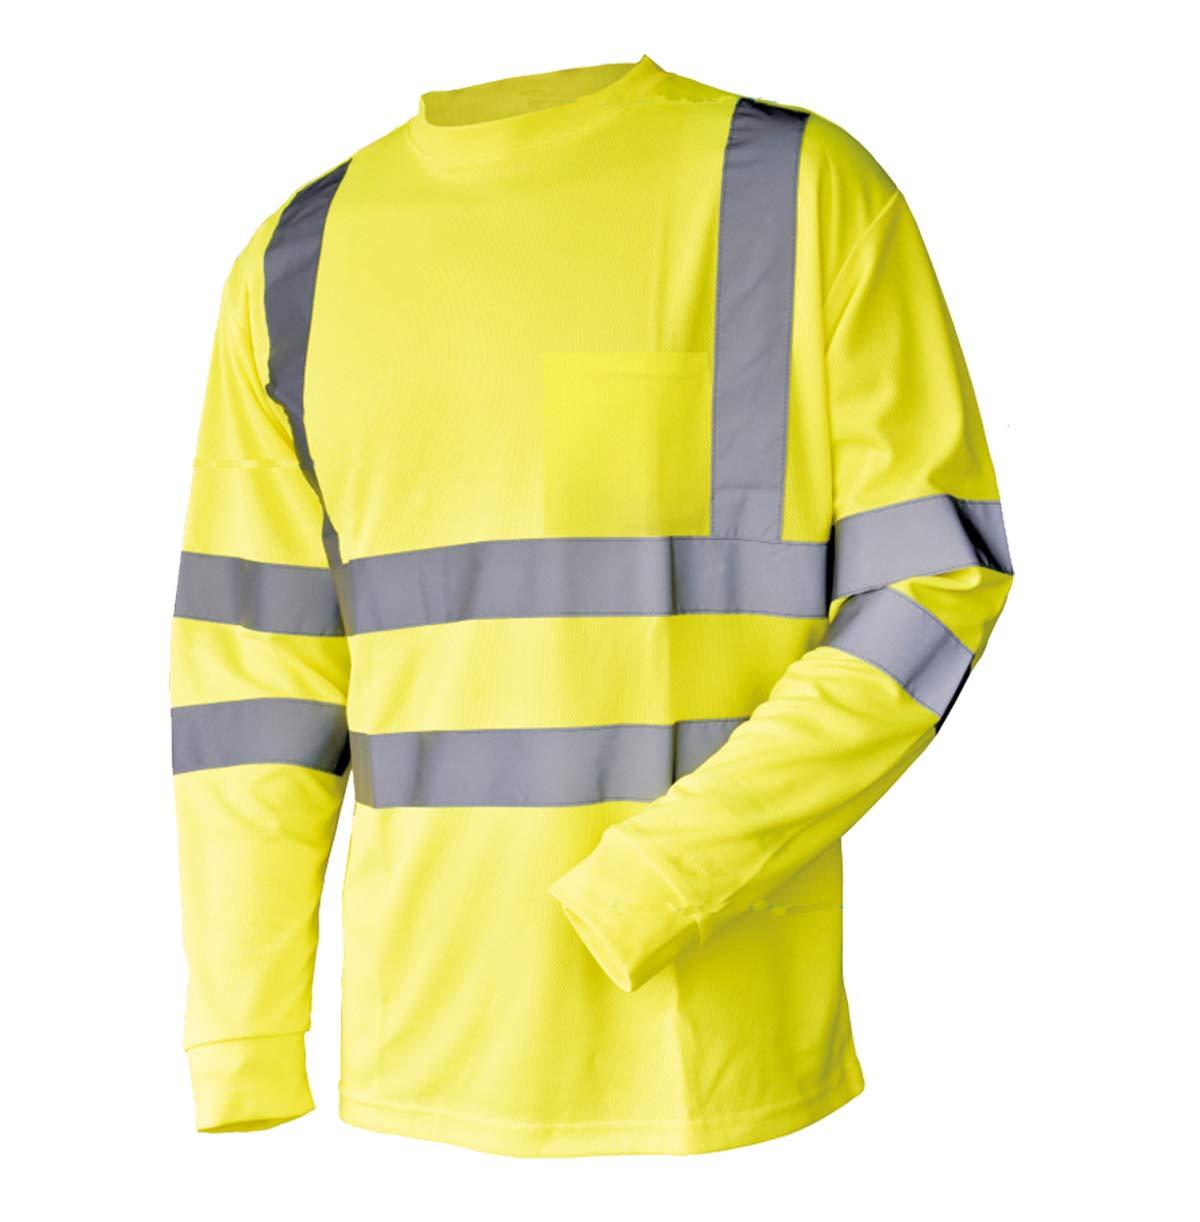 L&M Hi Vis T Shirt ANSI Class 3 Reflective Safety Lime Orange Short Long Sleeve HIGH Visibility (XL, Lime_L)